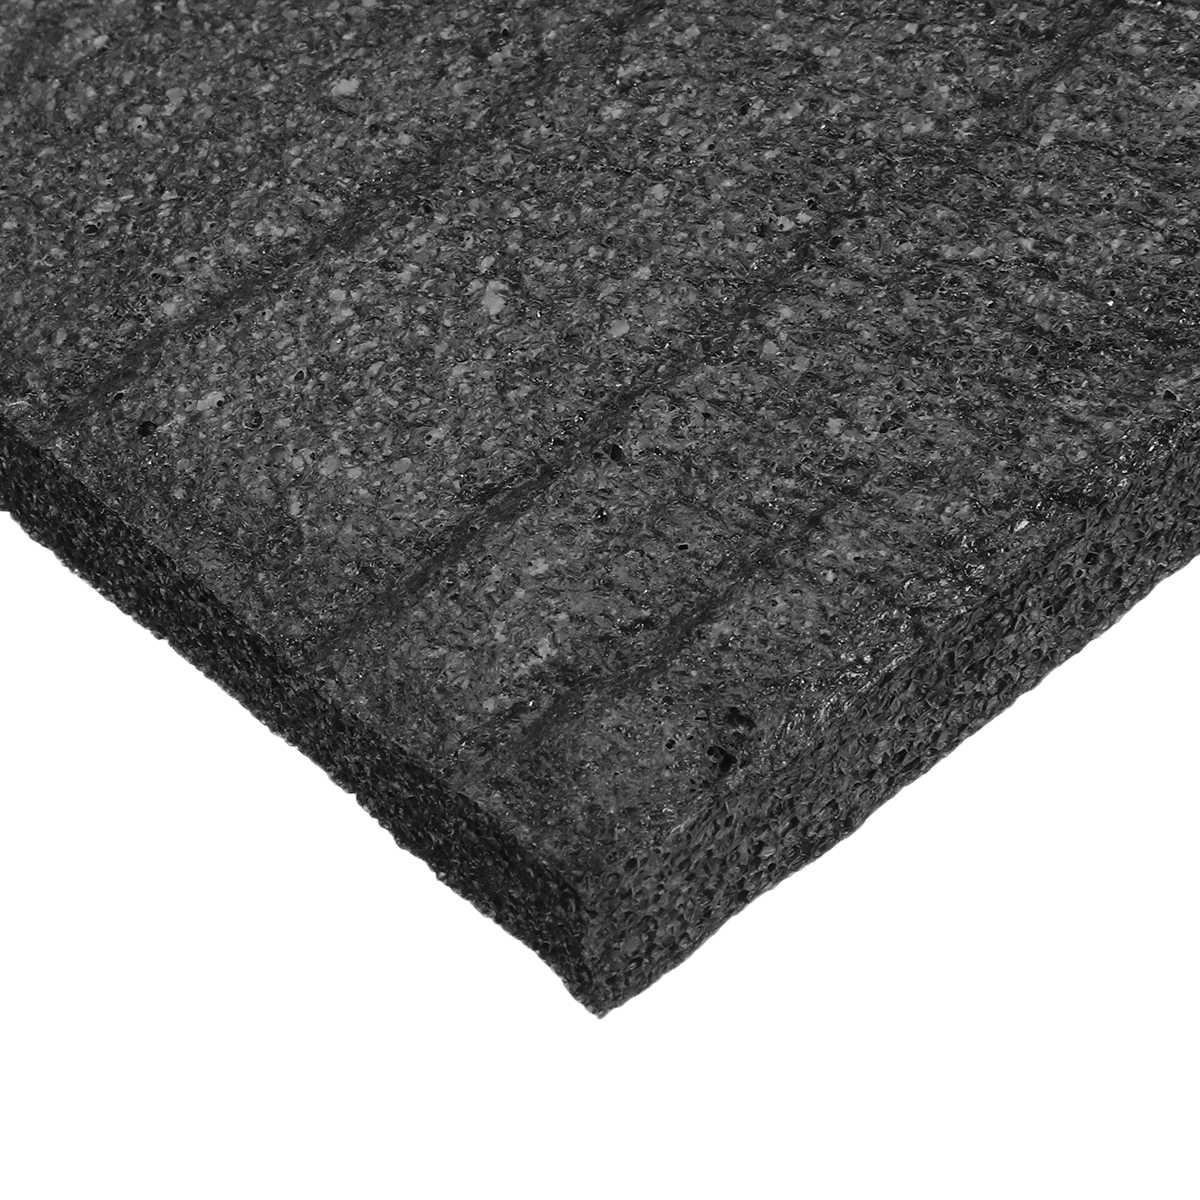 1roll 200cmx50cm 10mm 6mm 3mm Car Sound Proofing Deadening Car Truck Anti Noise Sound Insulation Cotton Heat Closed Cell Foam Sound Heat Insulation Cotton Aliexpress